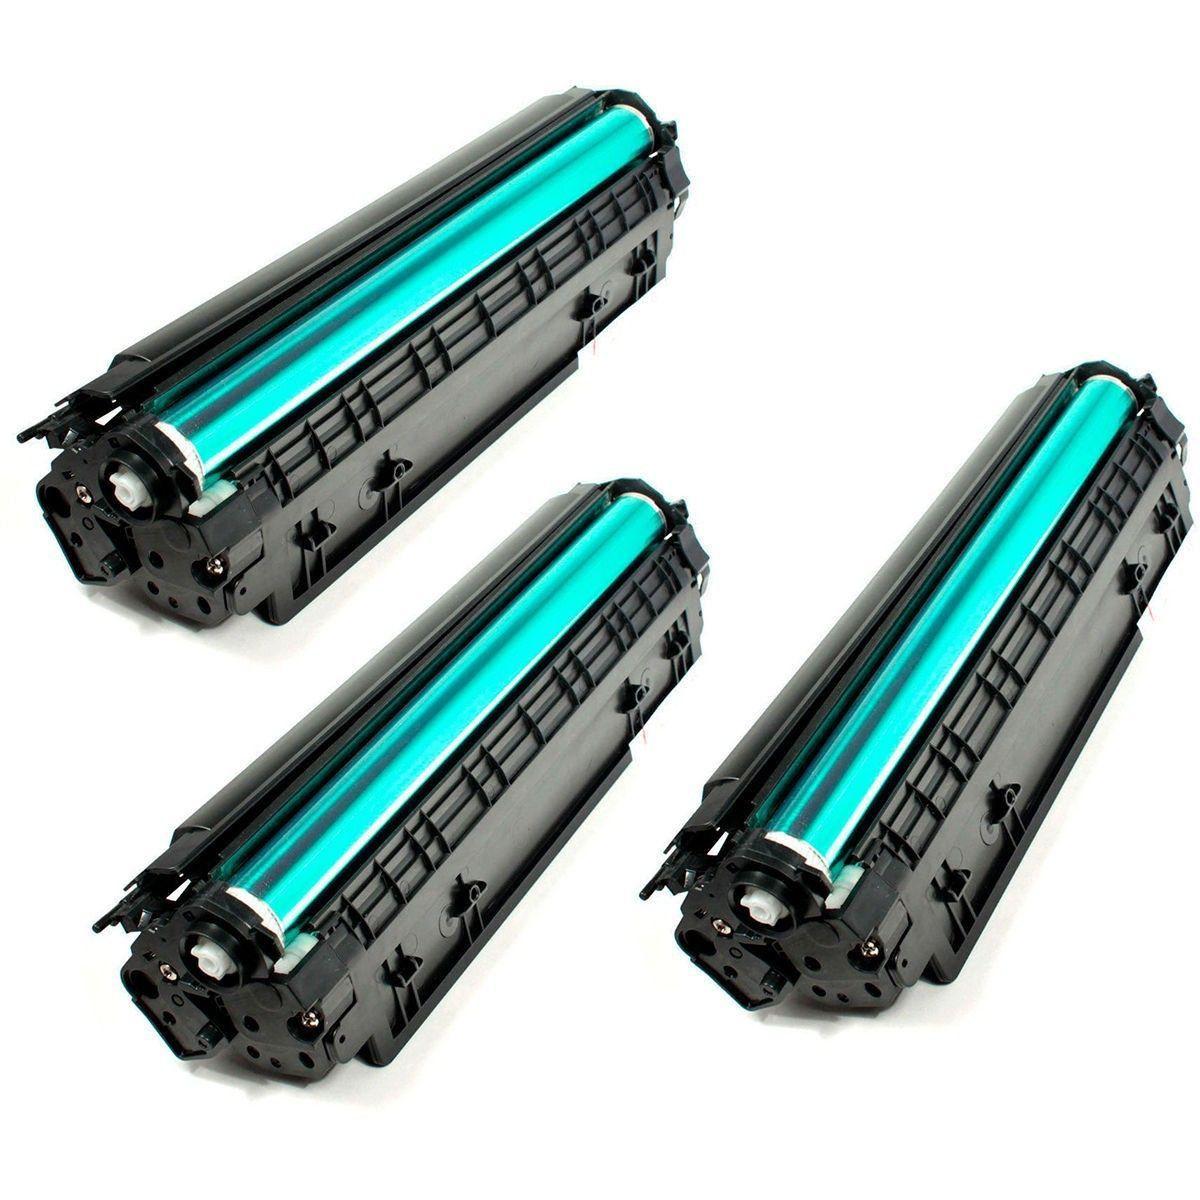 Compatível: Kit 3x Toner 285A 85A para HP M1212 P1102 P1102w P1109w M1130 M1132 M1217fw M1212nf 1109w / Preto / 1.800